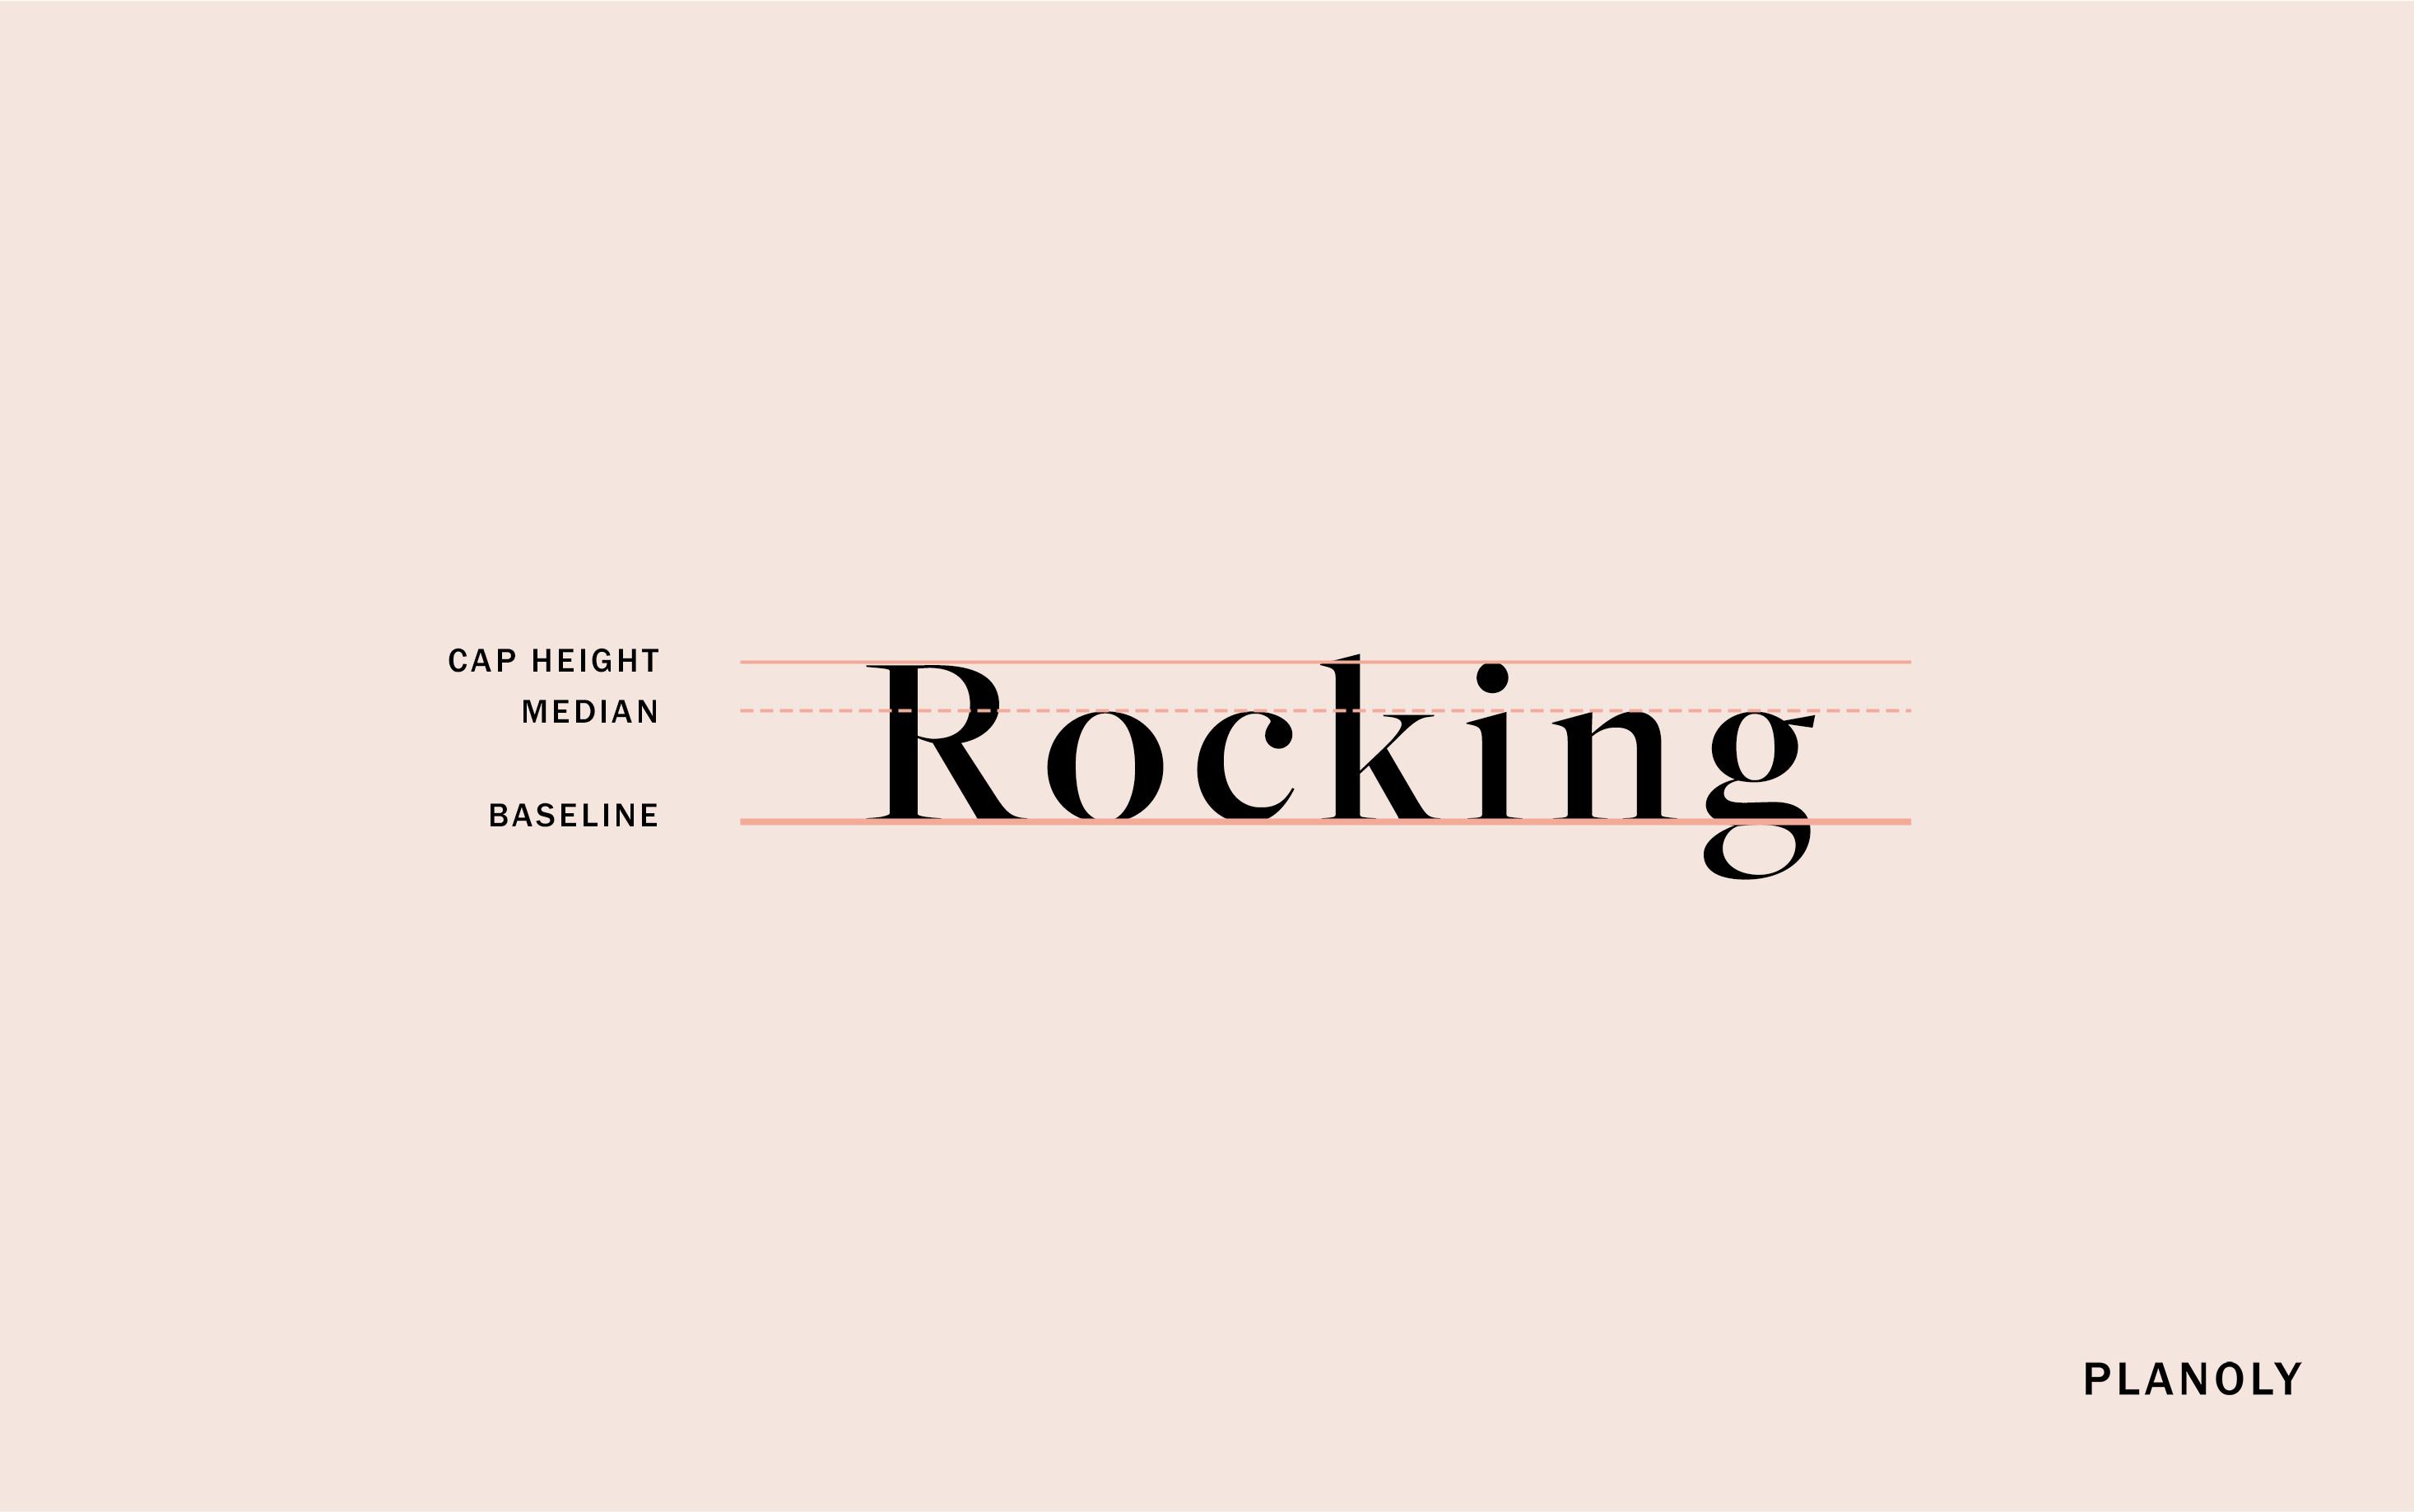 PLANOLY - Blog Post - Typography 101 - Image 1